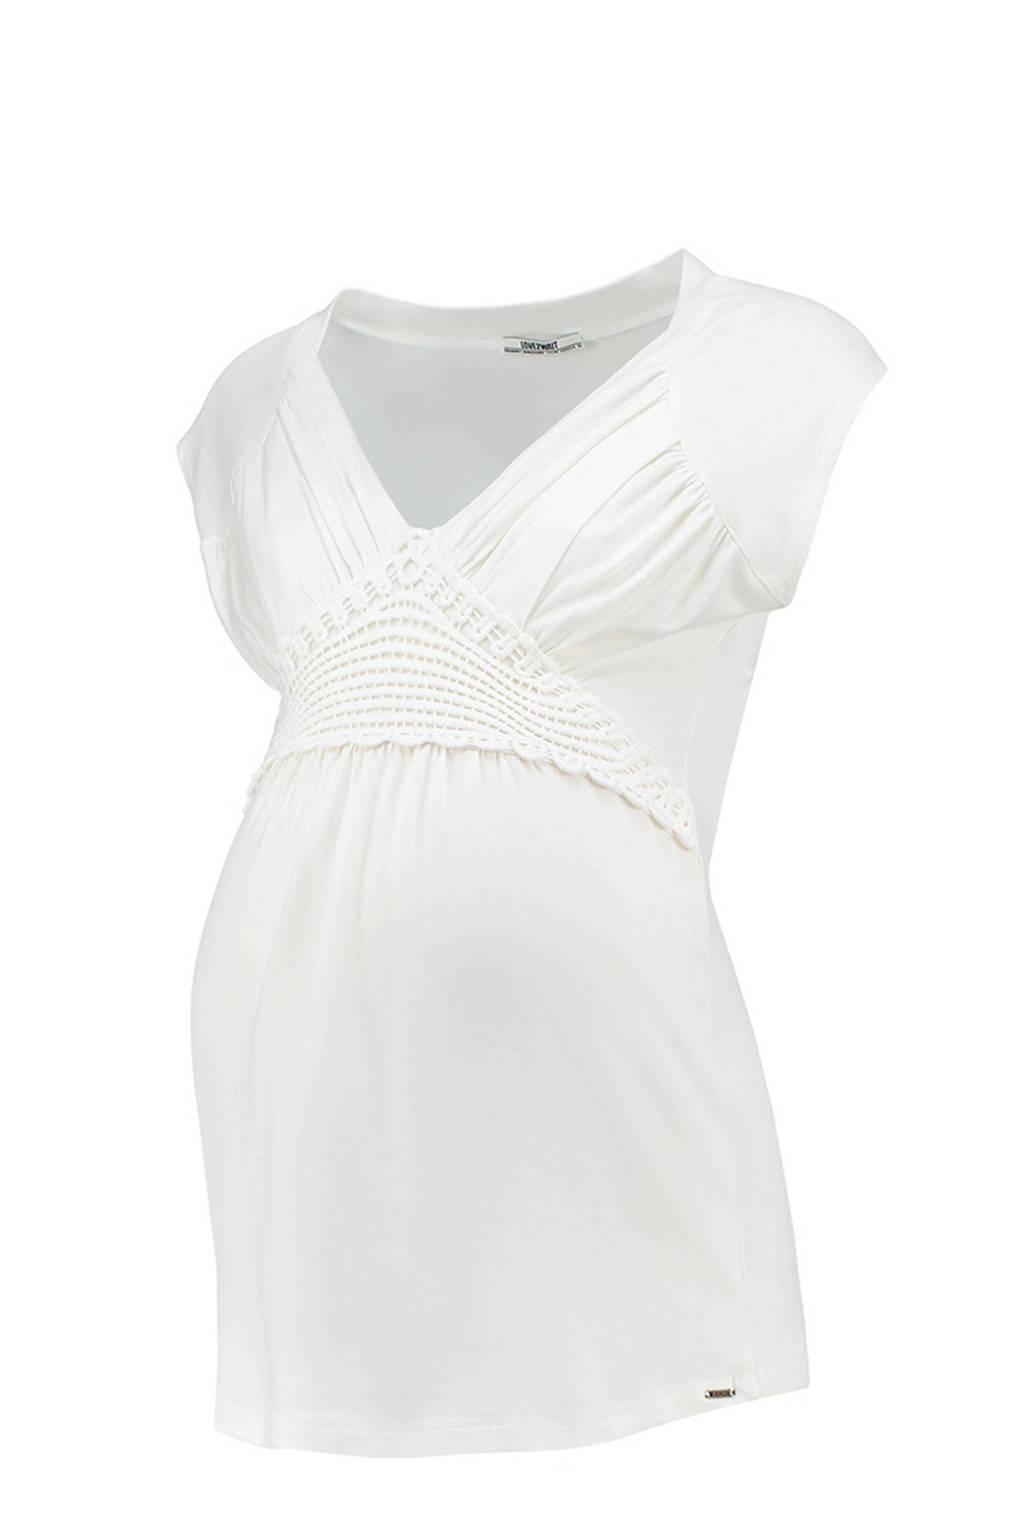 LOVE2WAIT zwangerschap + voeding T-shirt wit, Gebroken wit